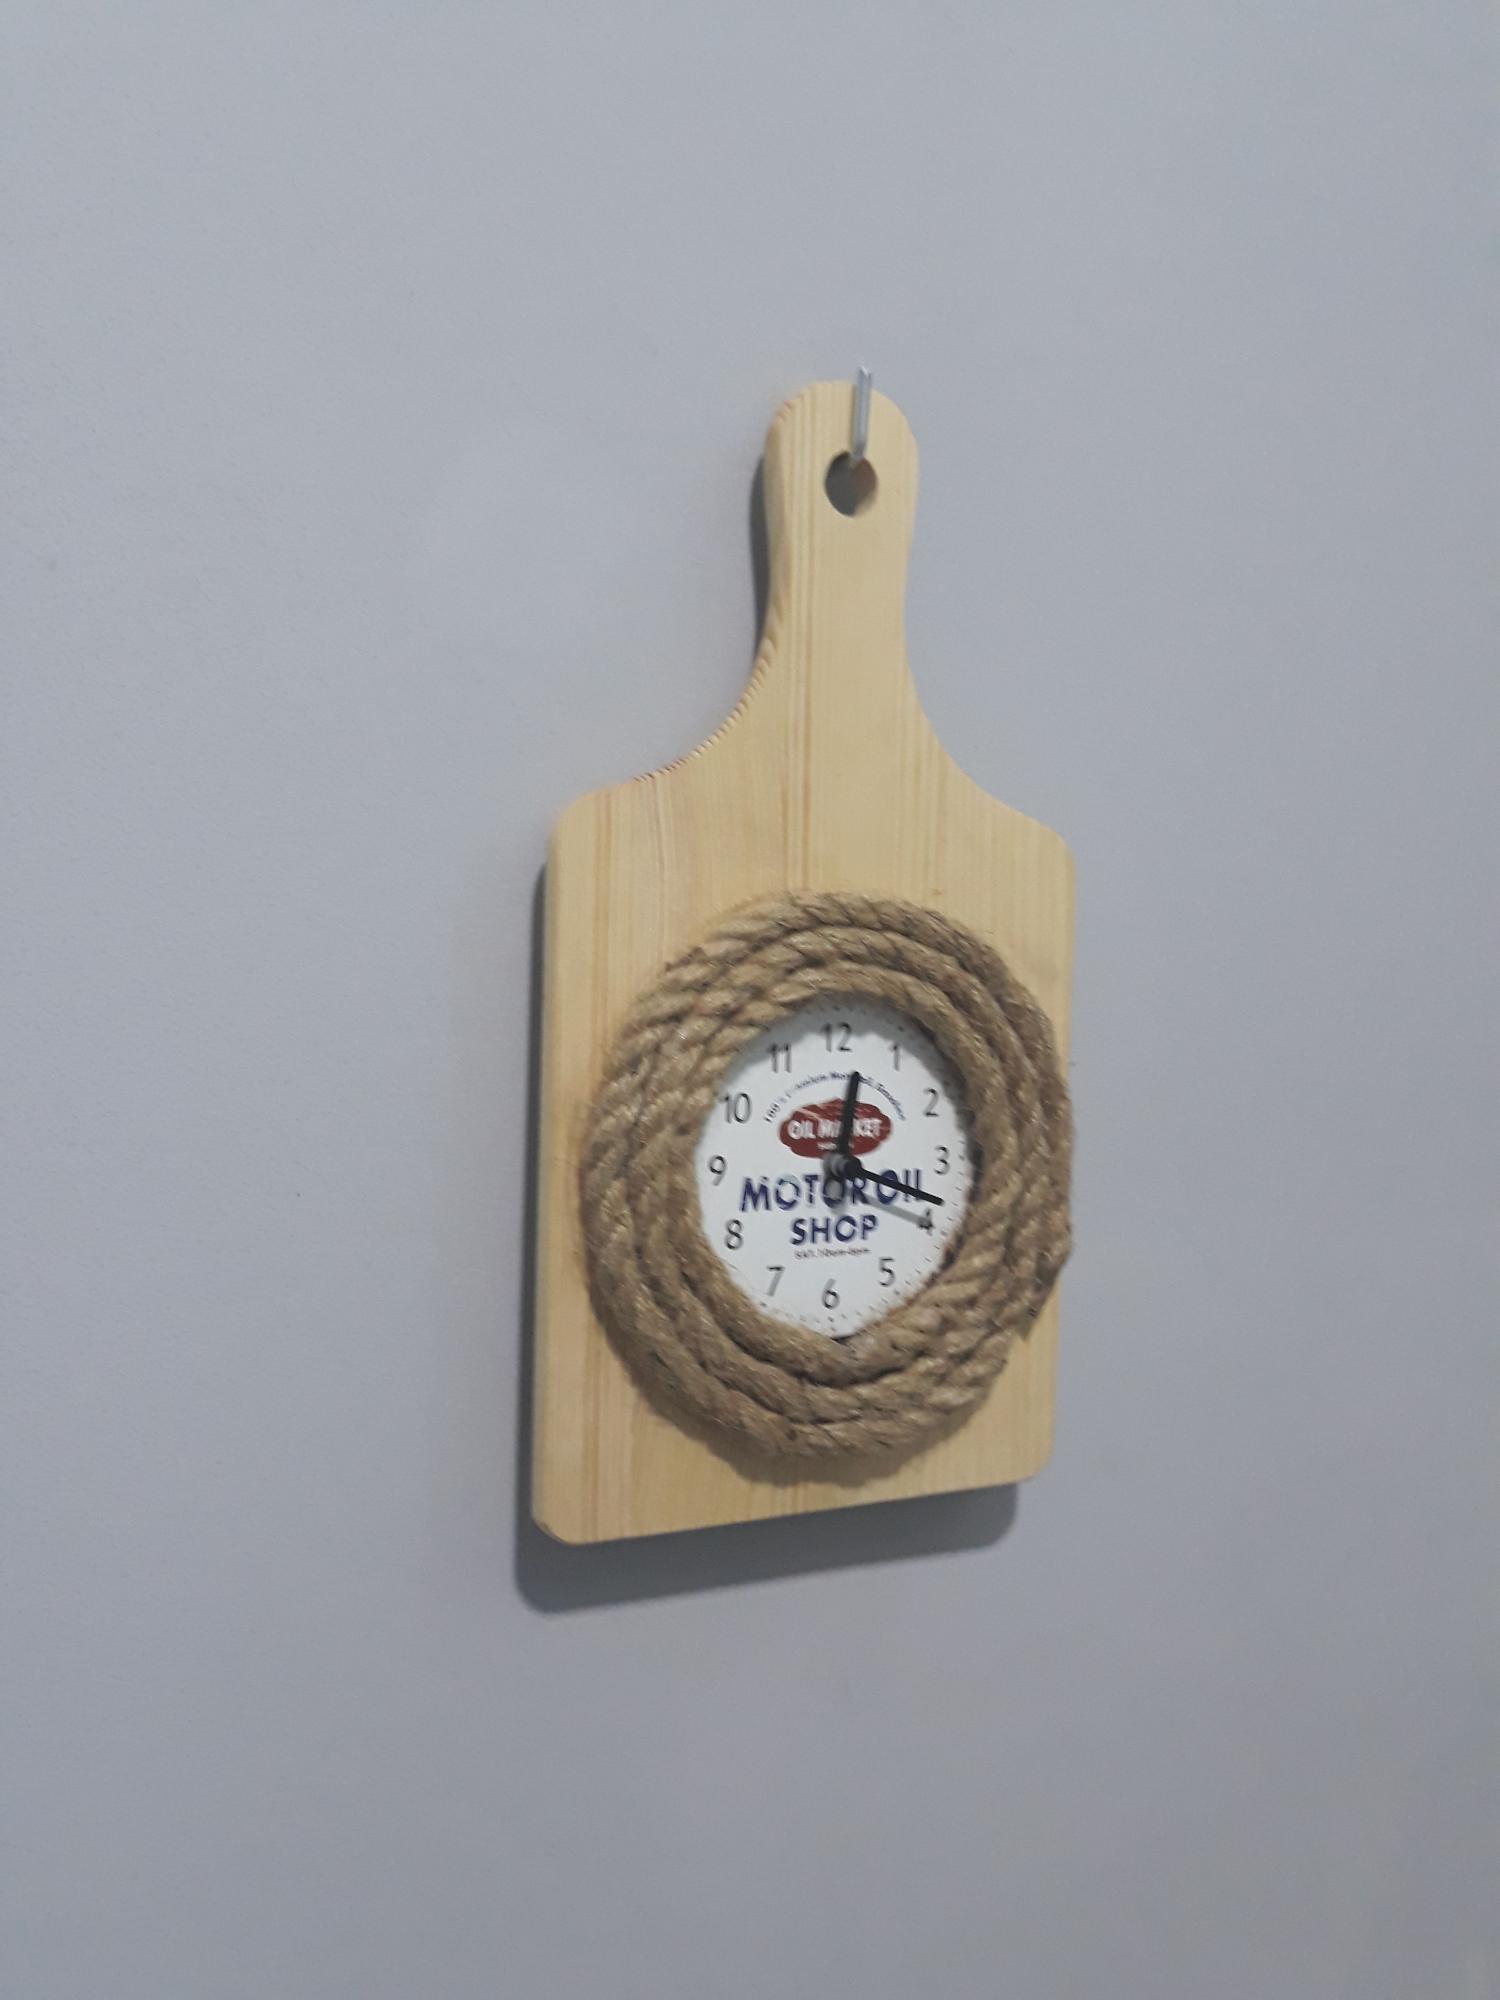 Đồng hồ gỗ tik tak